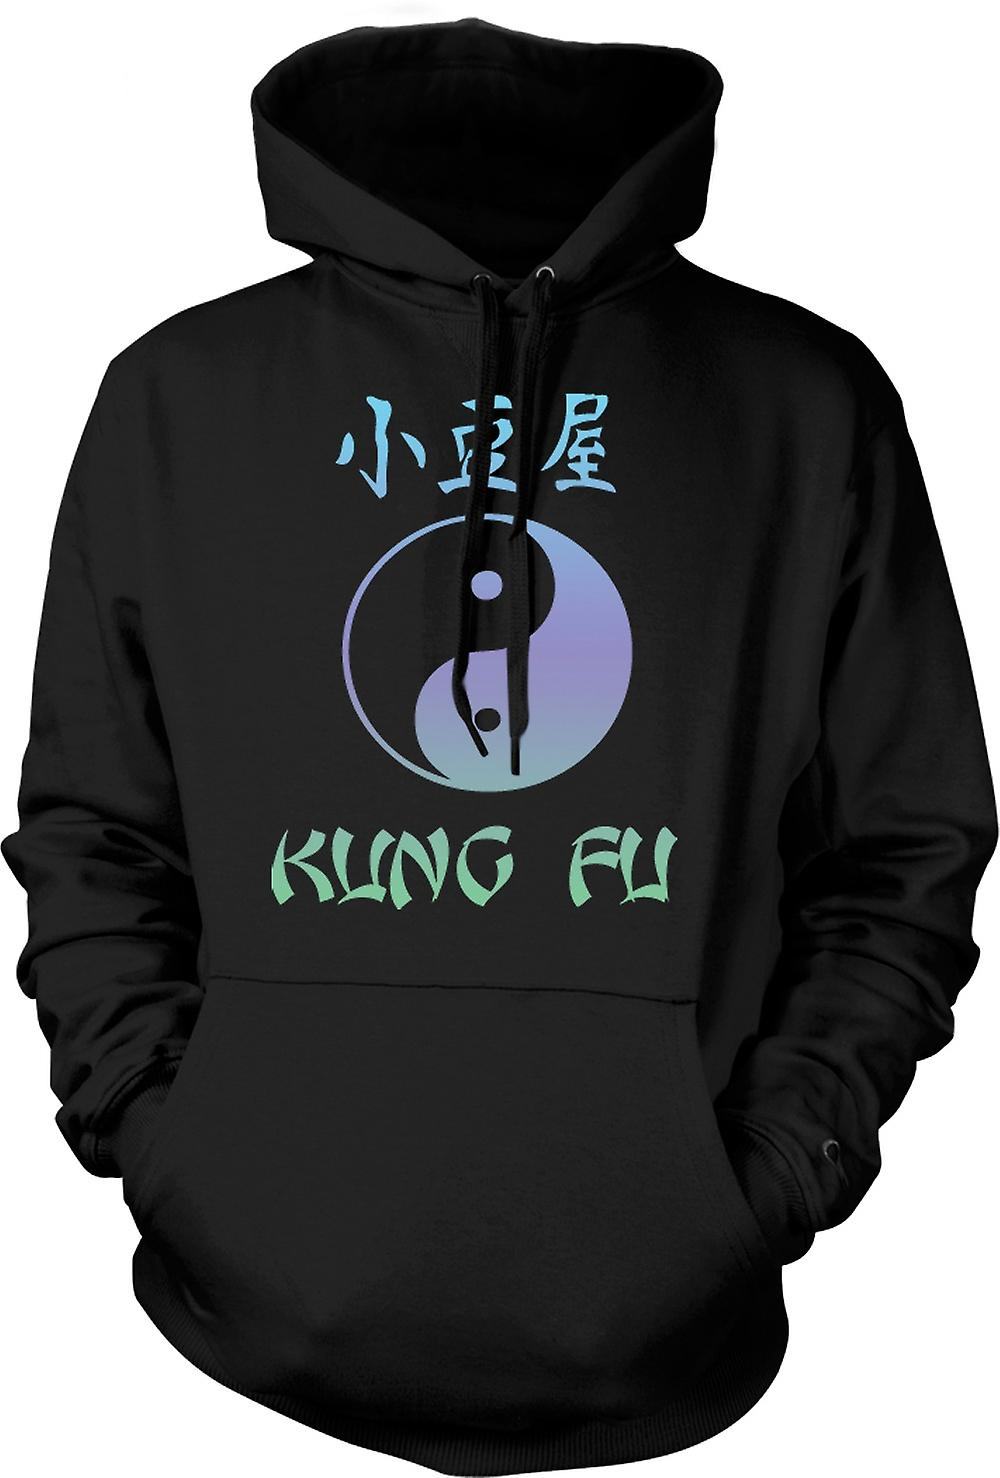 Mens Hoodie - Kung Fu - Ying Yang